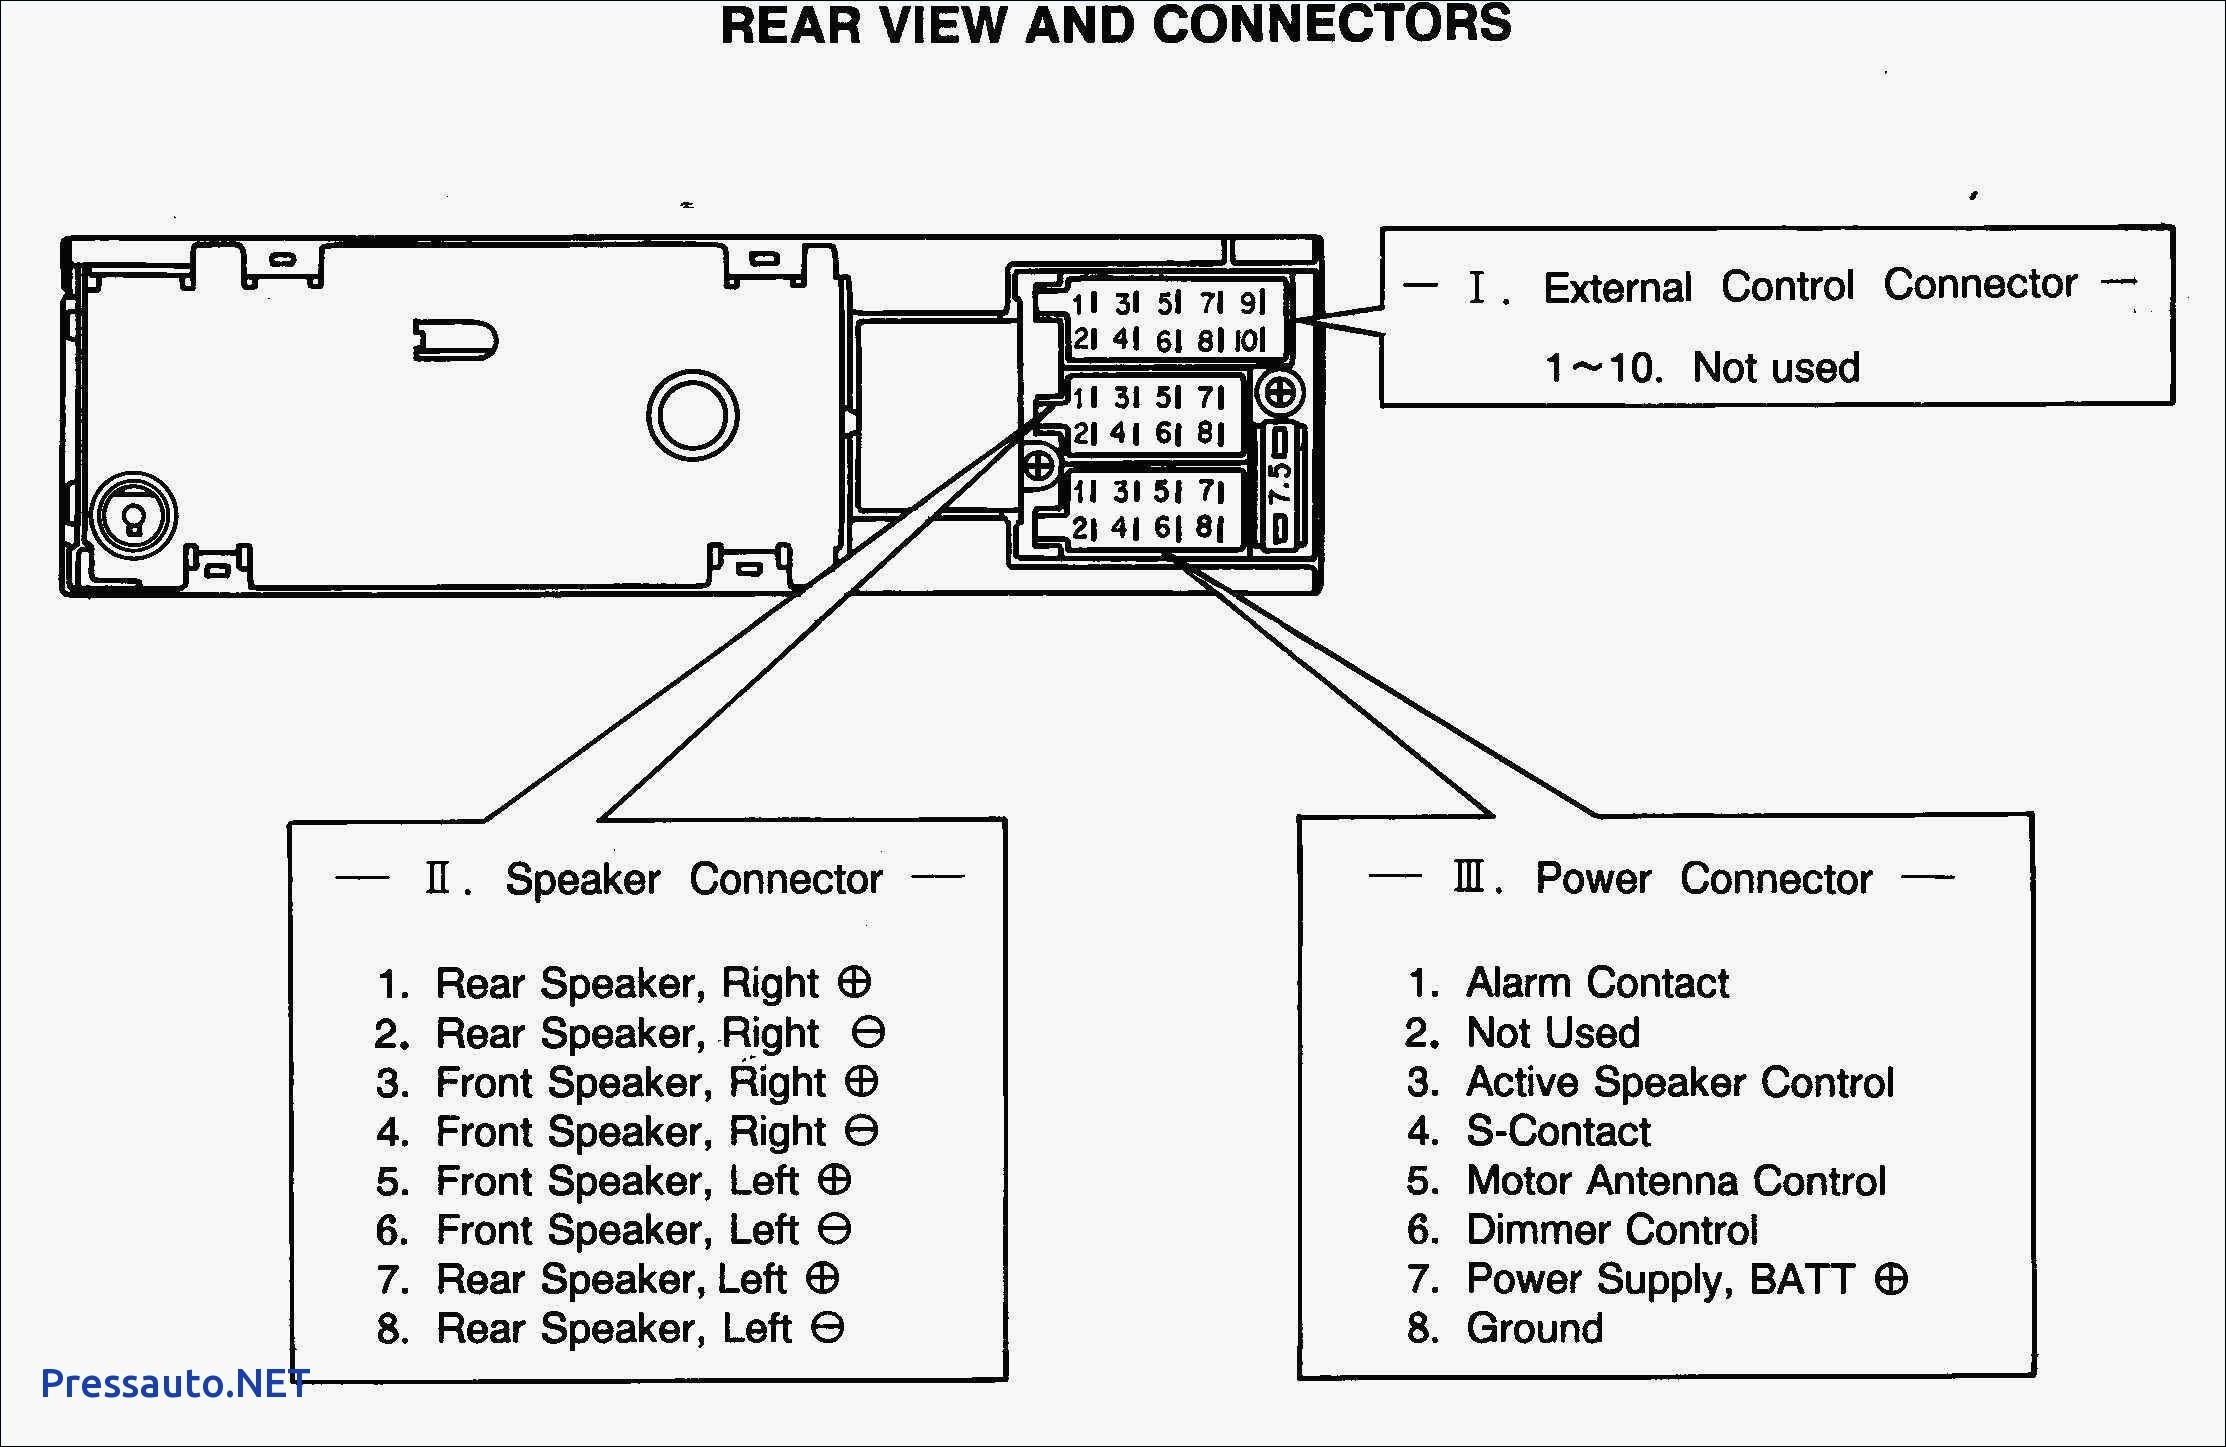 2000 Vw Jetta Radio Wiring Diagram 2000 Audi A4 Radio Wiring ... Radio Wiring Diagram For Nissan Altima on